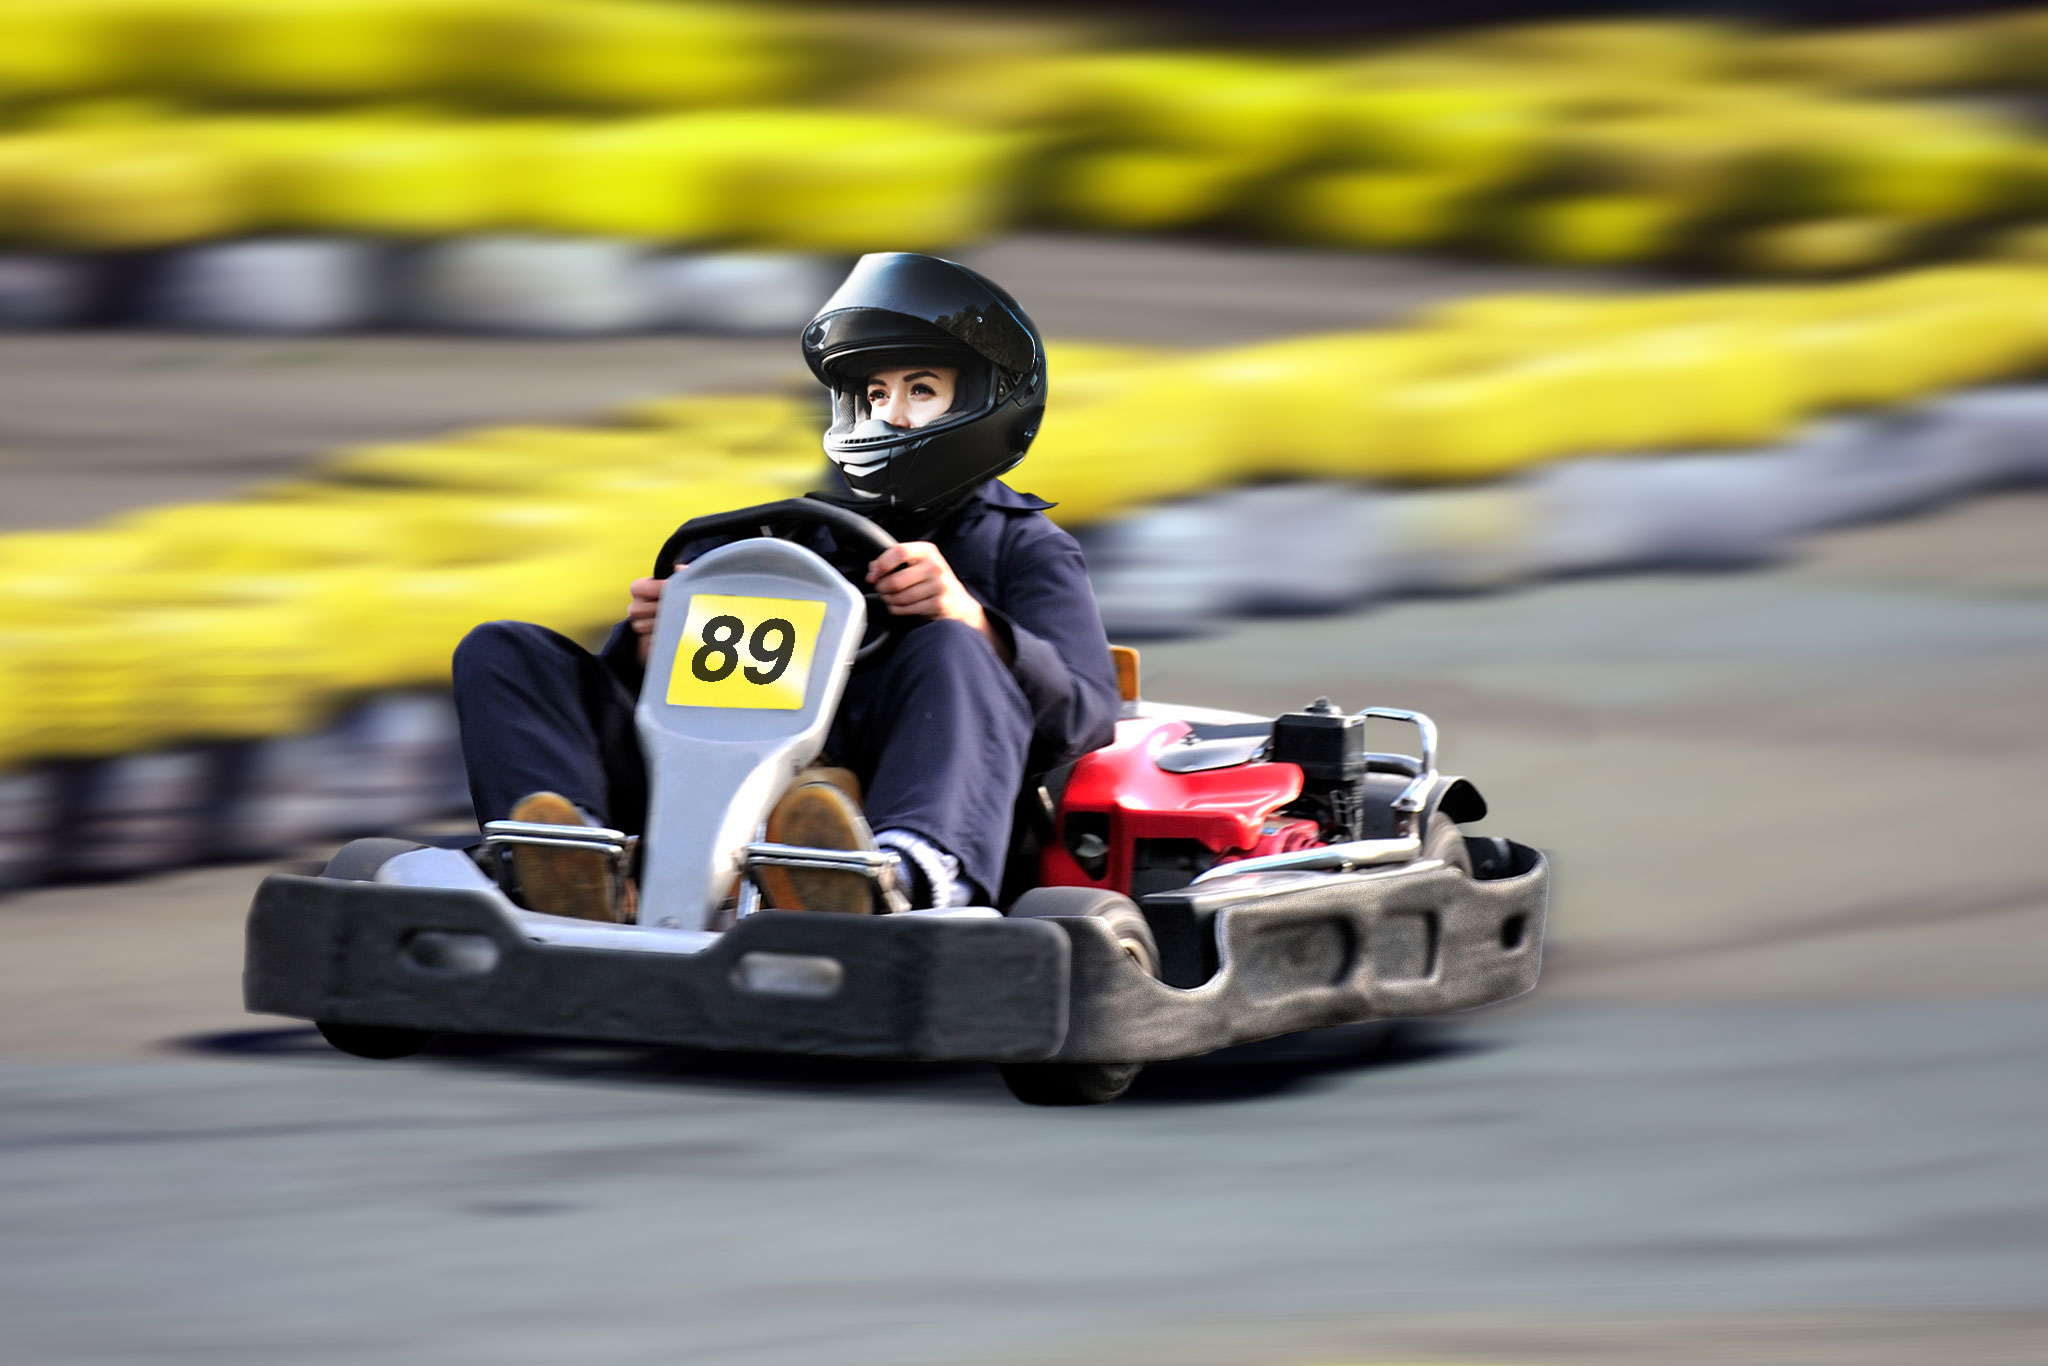 Go kart track near me